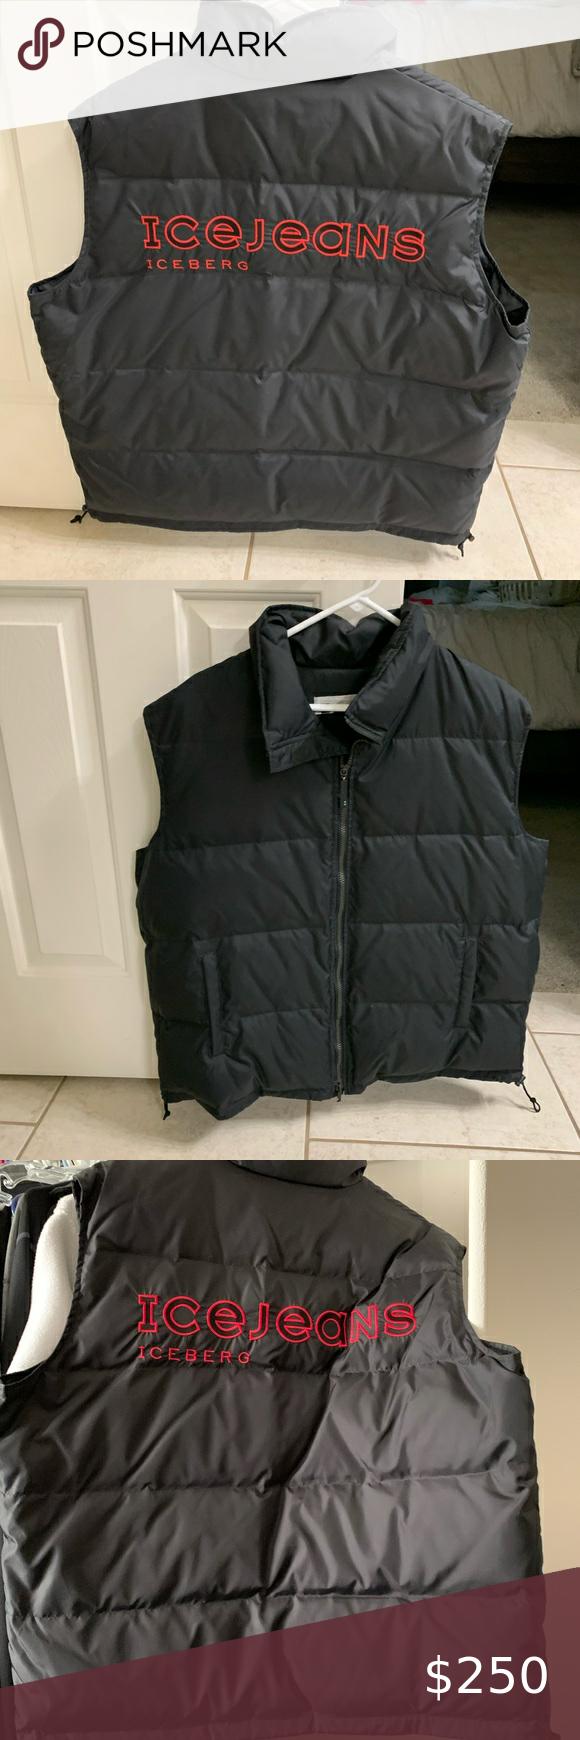 Men S Iceberg Vest Limited Edition Vest Jackets For Women Men [ 1740 x 580 Pixel ]